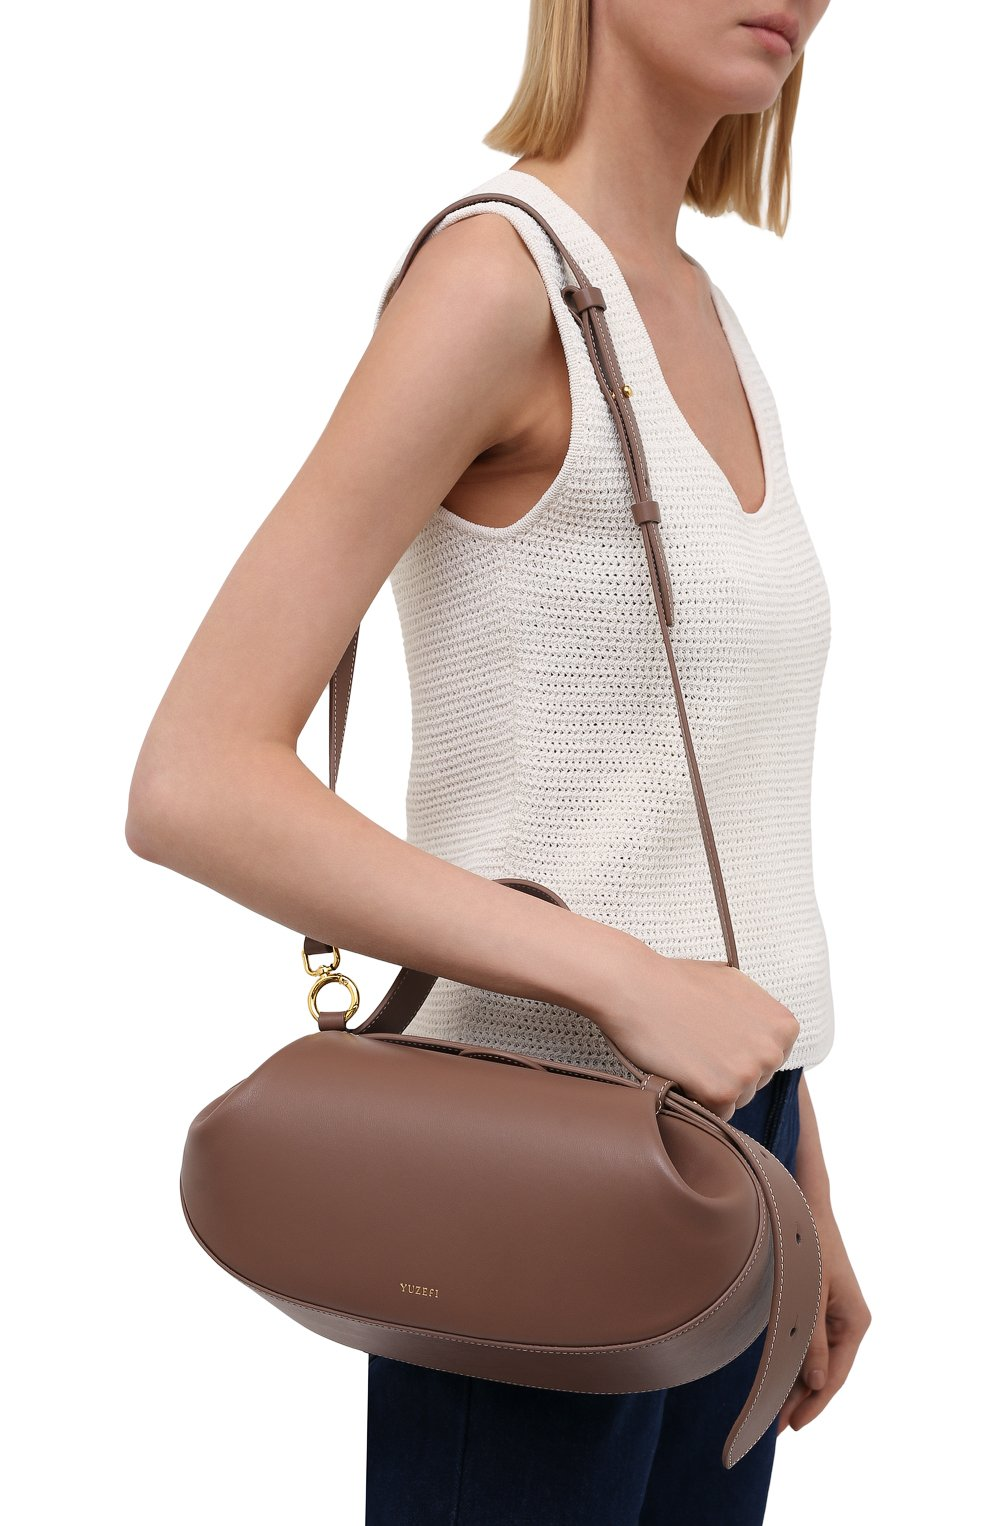 Женская сумка loaf YUZEFI бежевого цвета, арт. YUZPF21-HB-L0-14 | Фото 5 (Сумки-технические: Сумки top-handle; Размер: medium; Материал: Натуральная кожа; Ремень/цепочка: На ремешке)